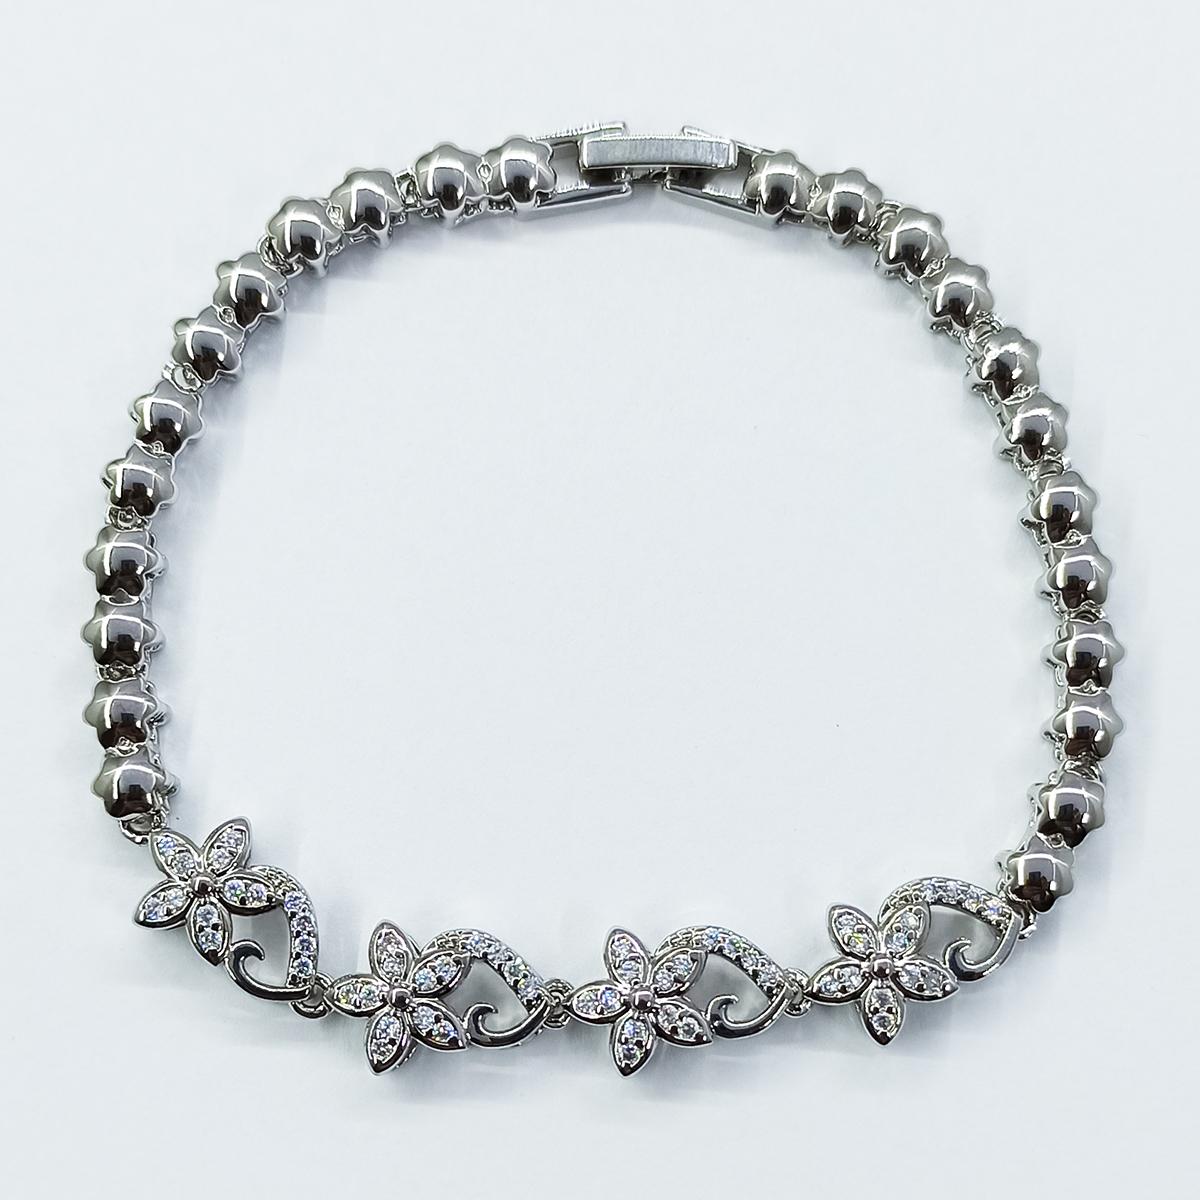 دستبند زنانه سلین کالا مدل ce-As6